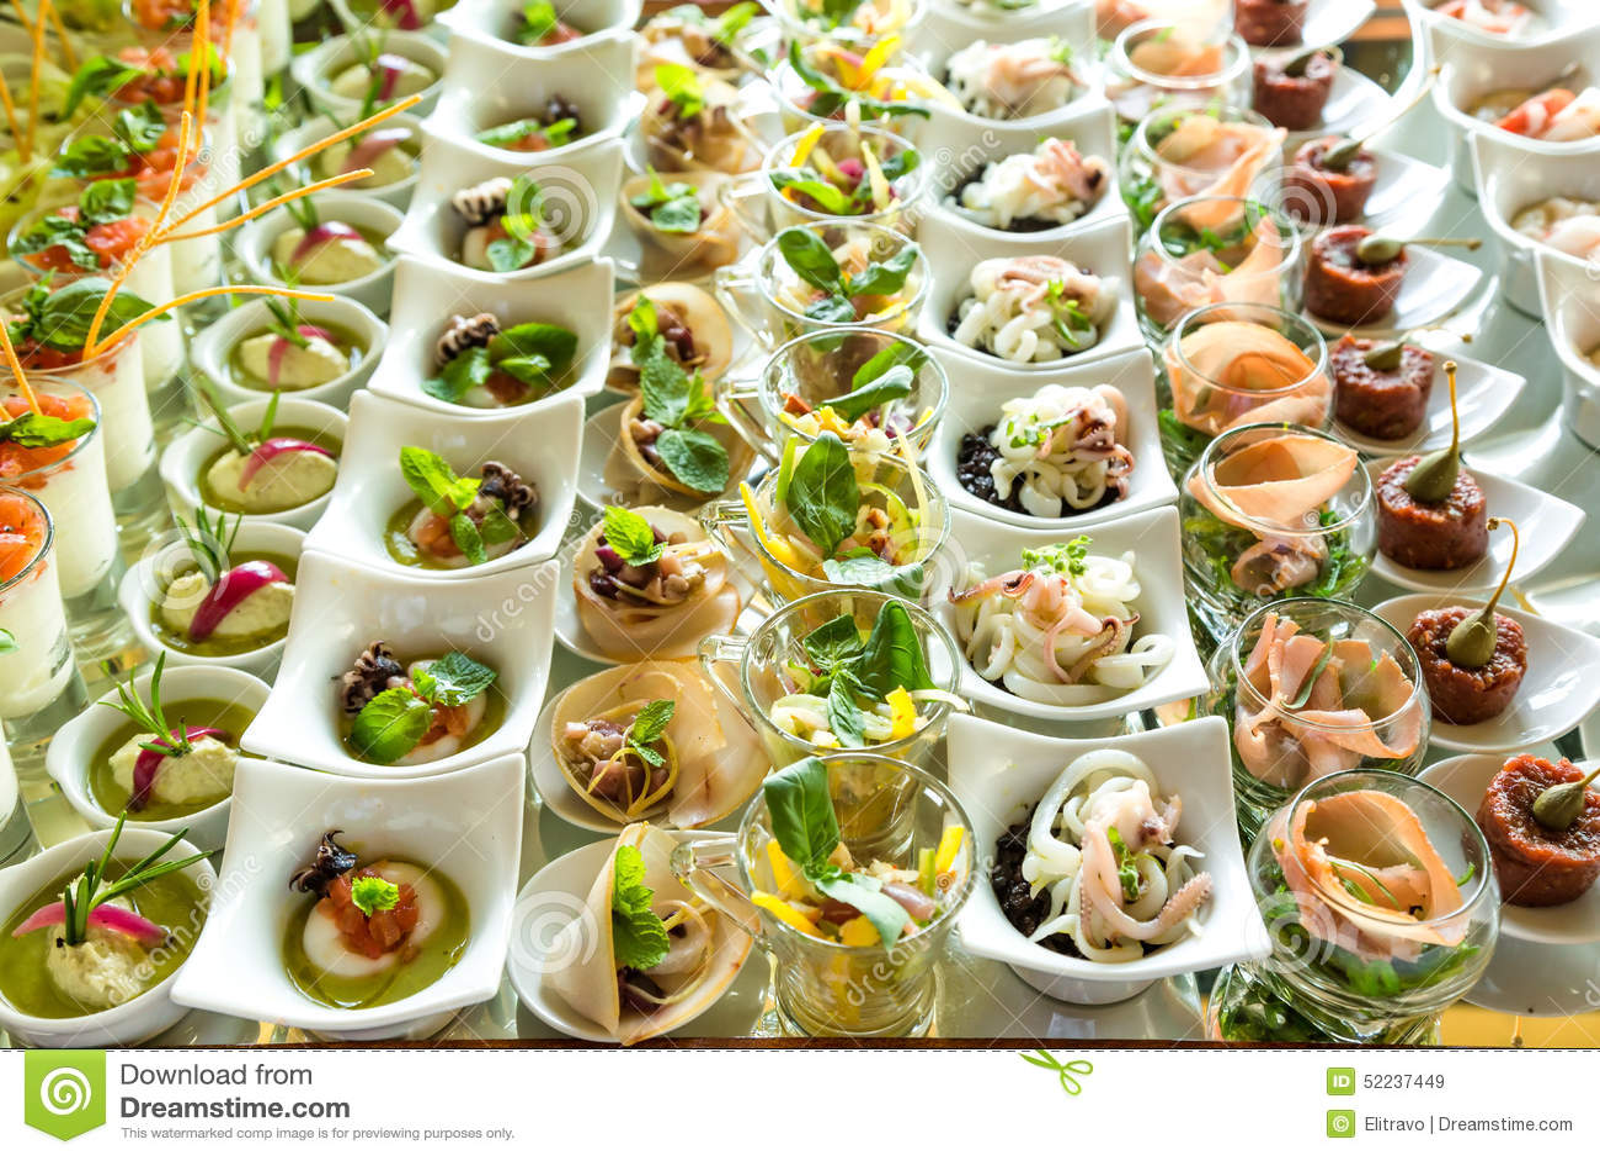 Elegant Appetizers Stock Photo Image 52237449